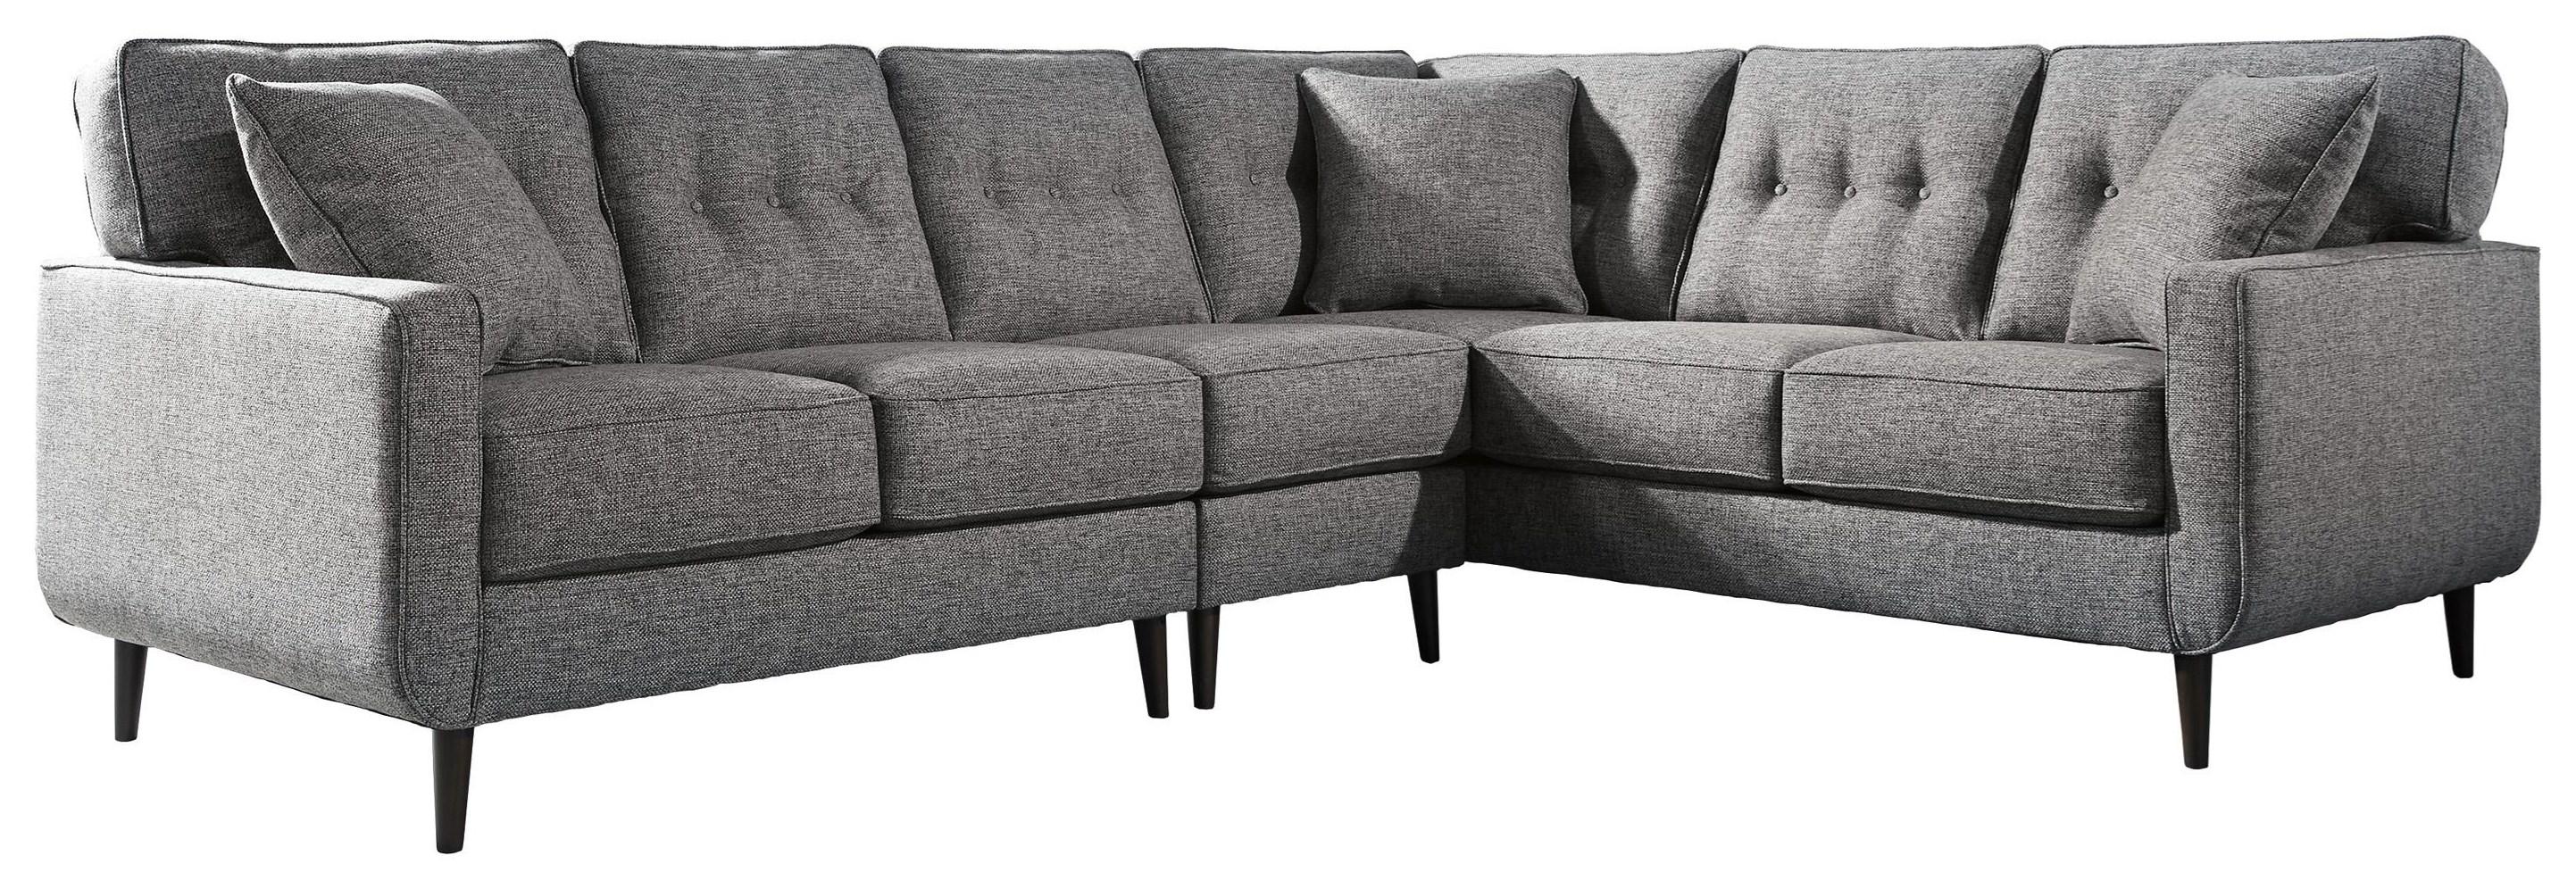 Ashley Furniture Zardoni 11402 49 55 46 3 Piece Right Arm